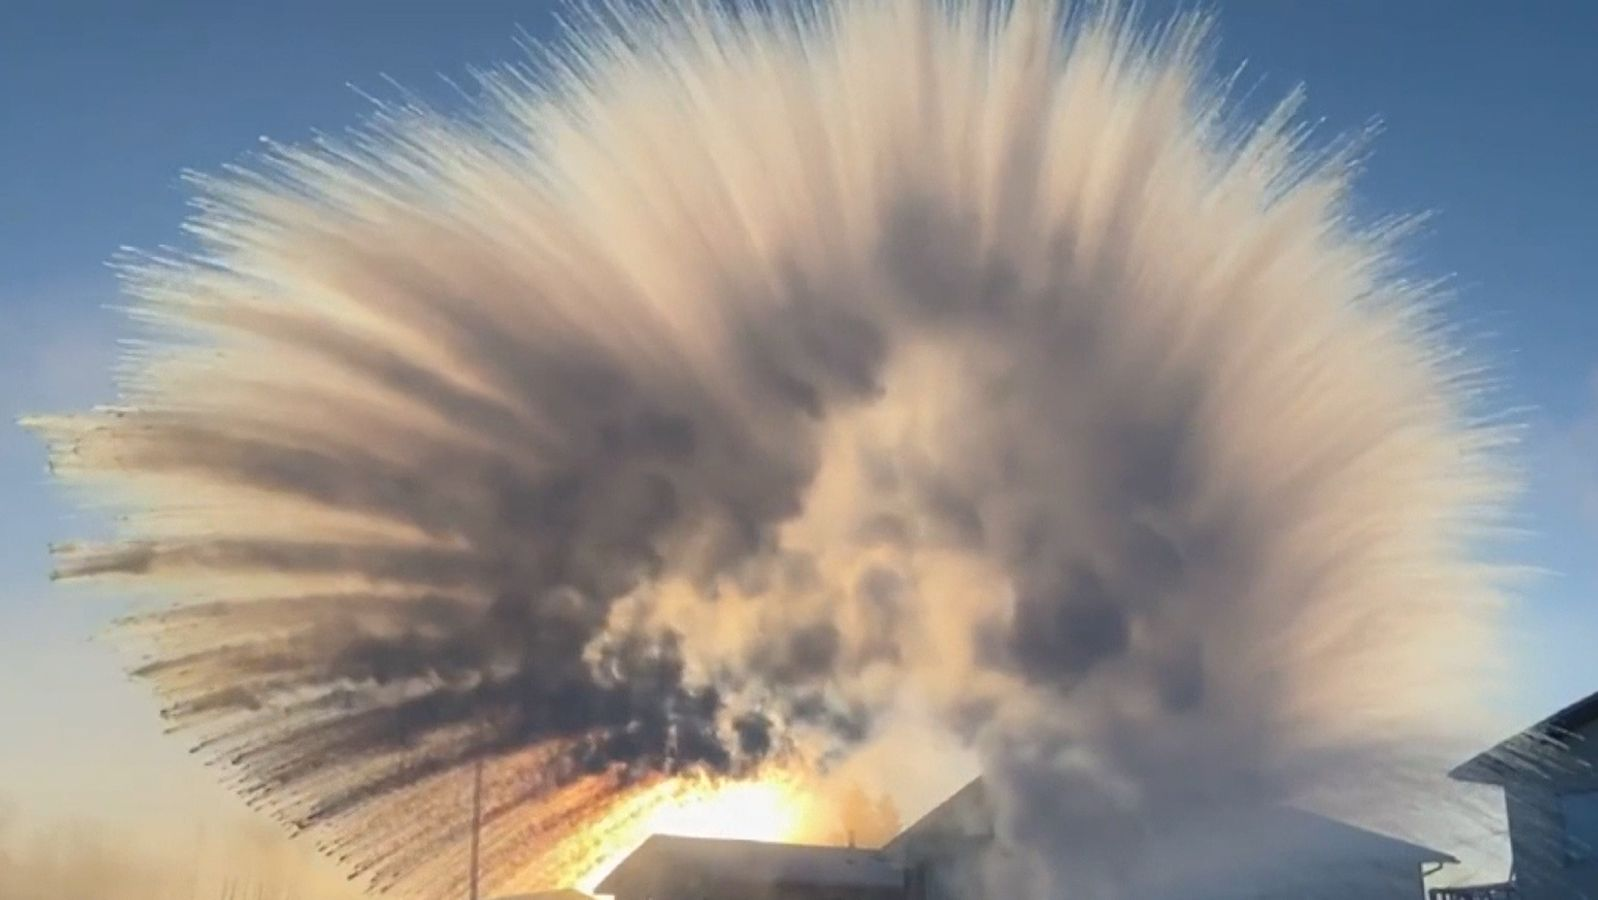 Kanada: Eindrucksvolles Experiment in Rekord-Kälte - BR24